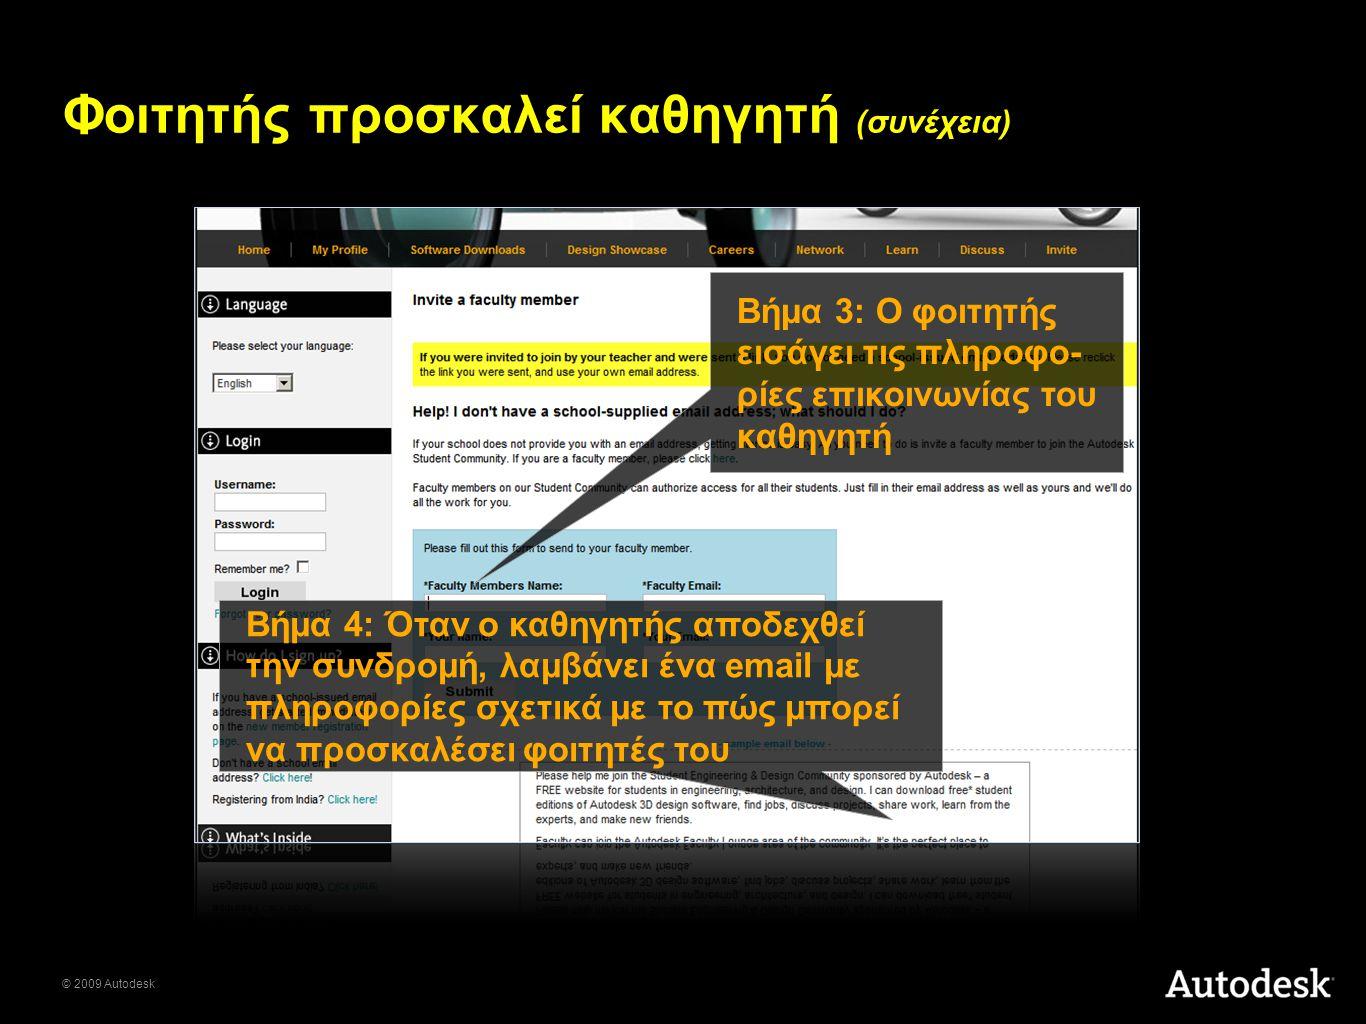 © 2009 Autodesk Βήμα 3: Ο φοιτητής εισάγει τις πληροφο- ρίες επικοινωνίας του καθηγητή Βήμα 4: Όταν ο καθηγητής αποδεχθεί την συνδρομή, λαμβάνει ένα e